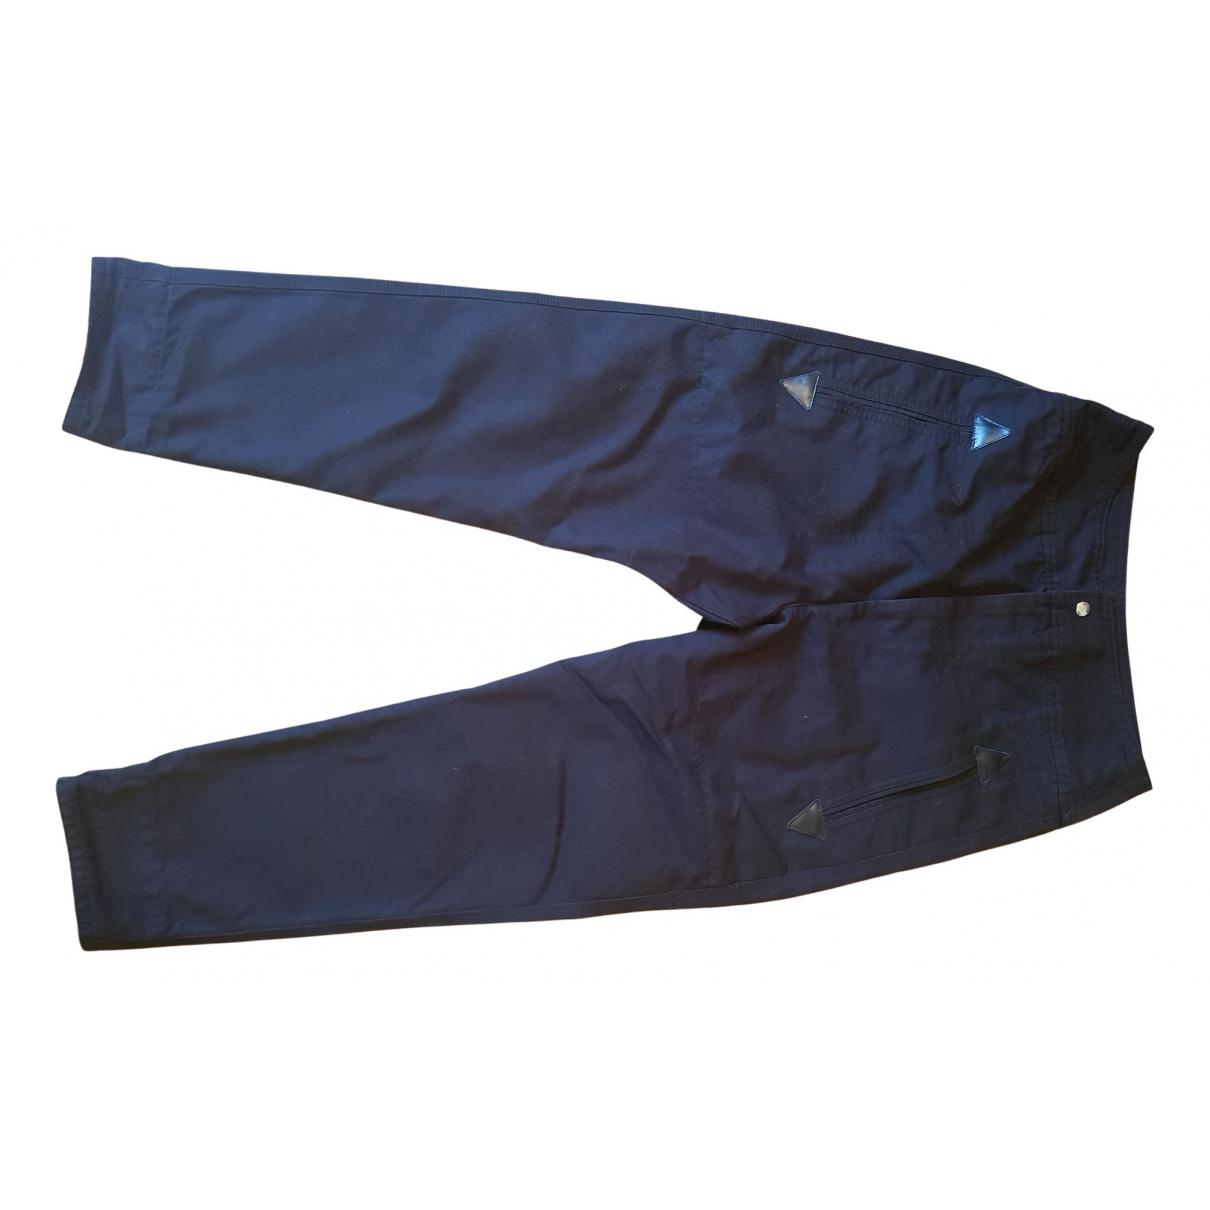 Isabel Marant Etoile N Black Cotton Trousers for Women 36 FR